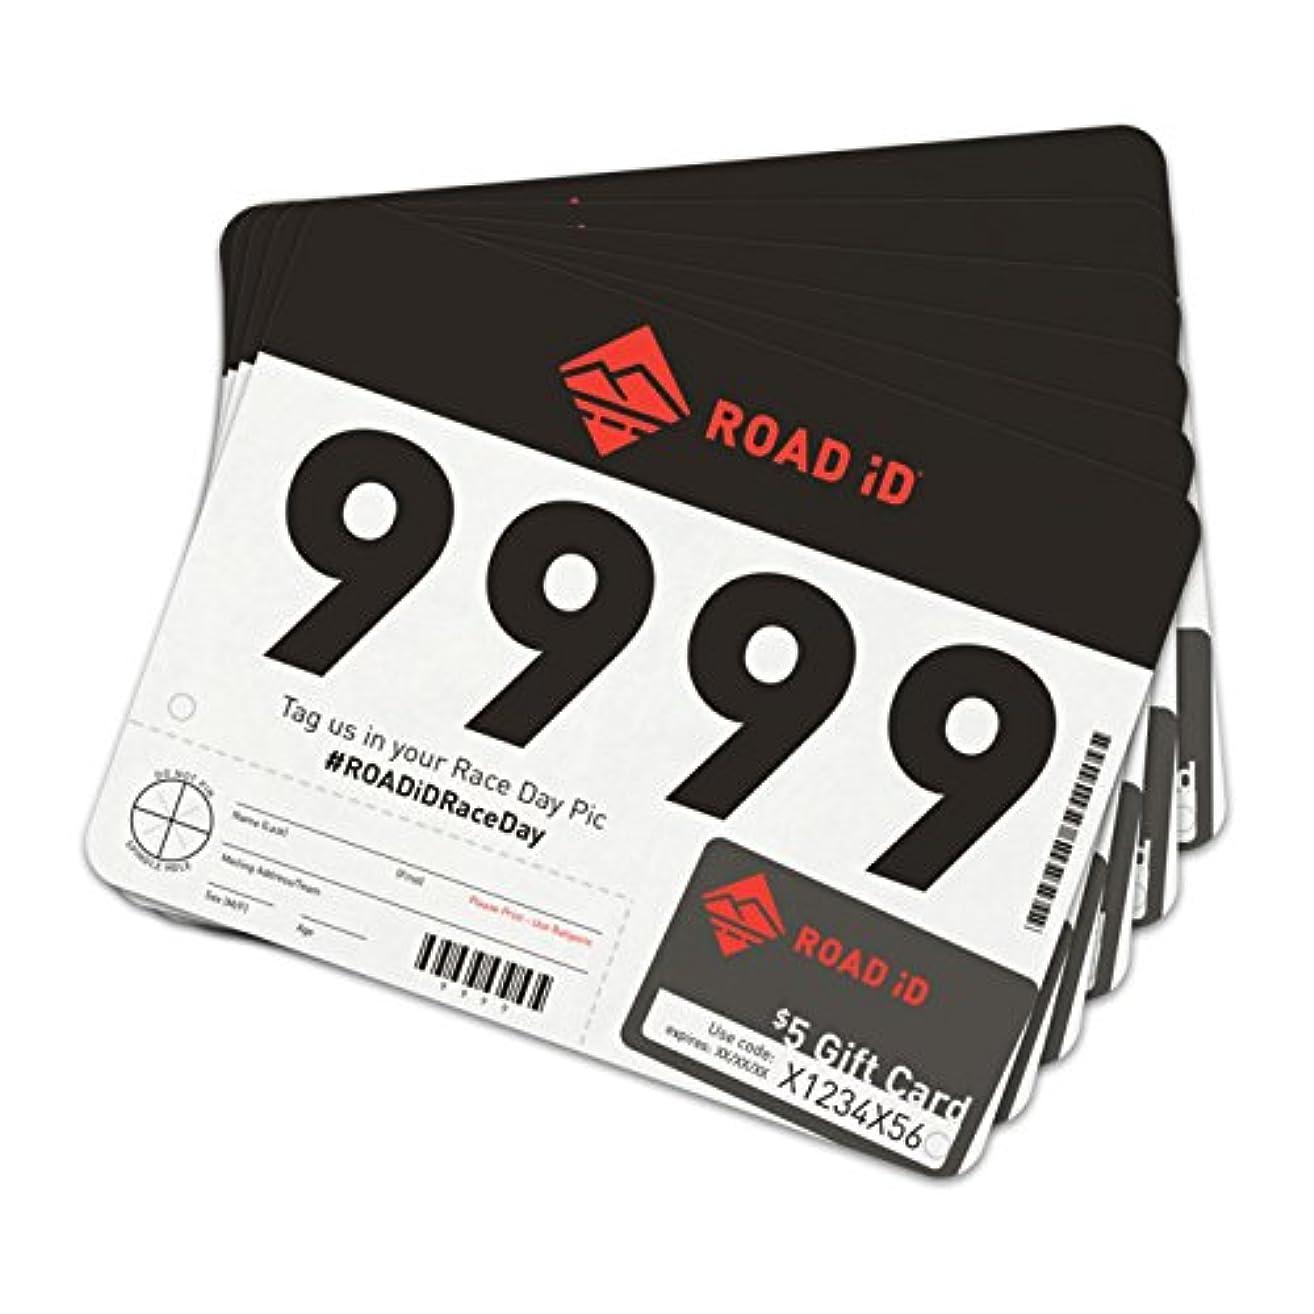 Road ID Running Bibs - Race Bibs, Race Numbers, Sports Bibs, Running Tags, Race Tags